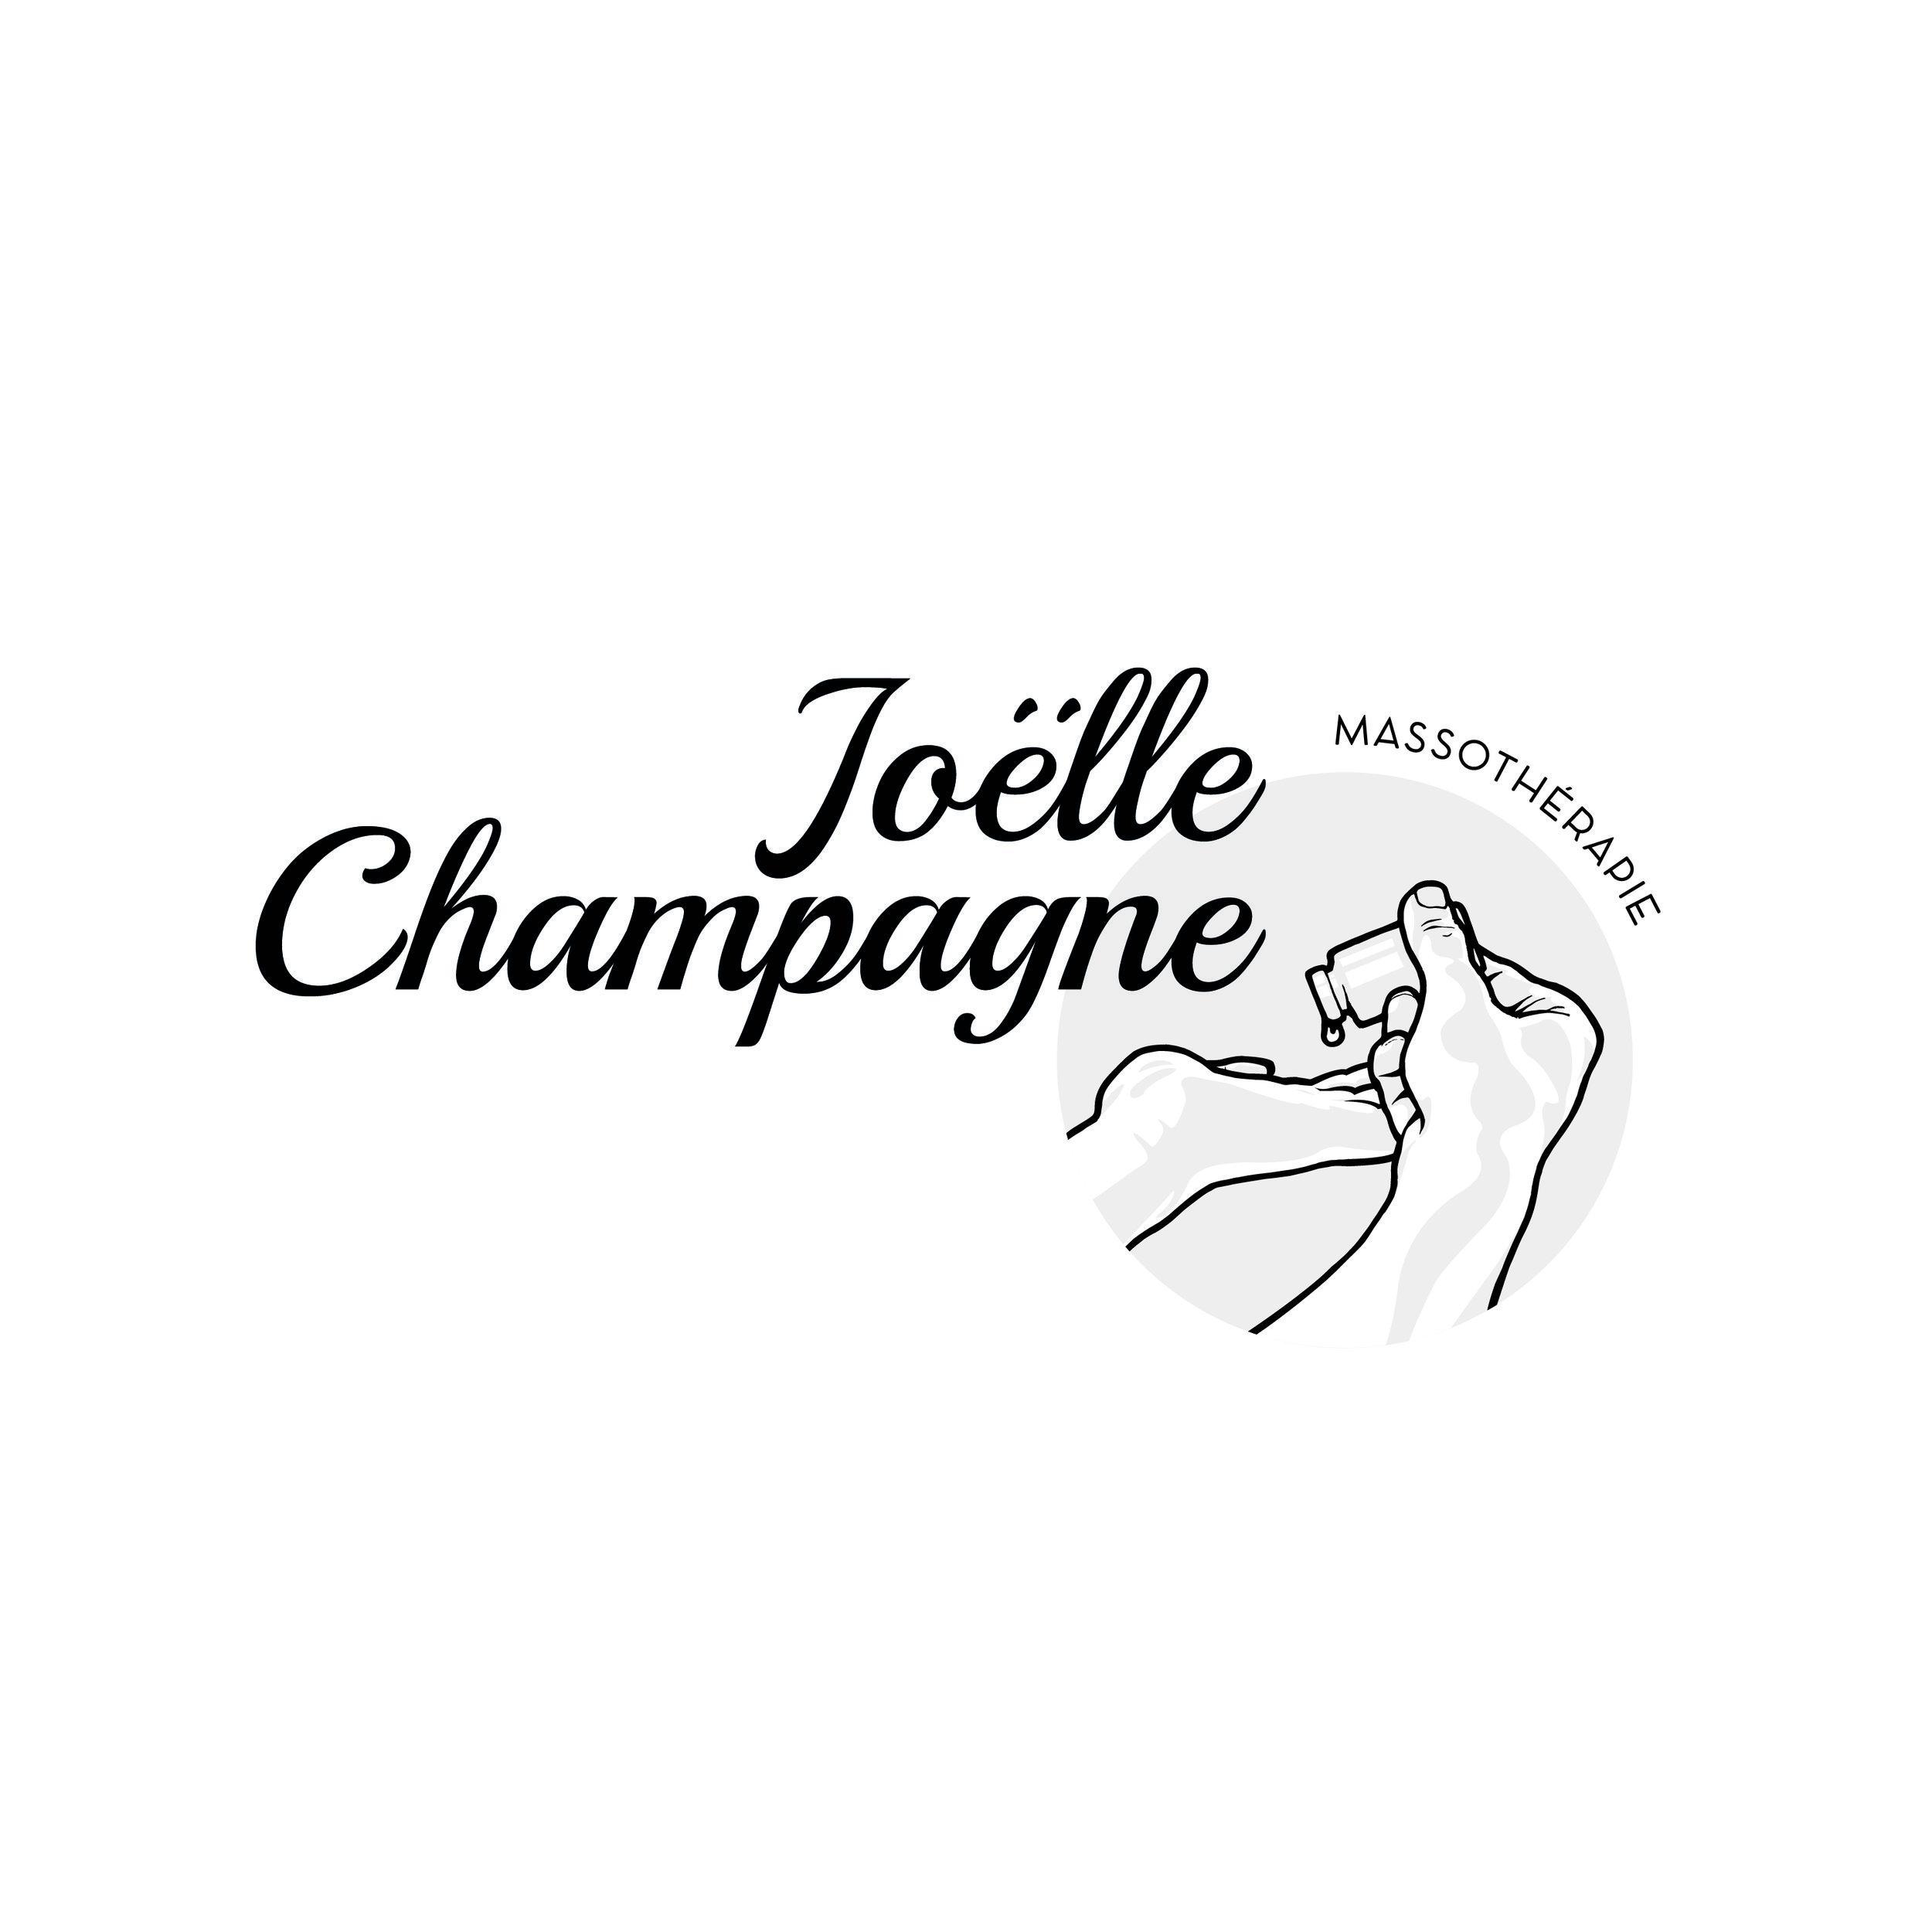 2018-JoelleChampagneMasso-Noir.jpg